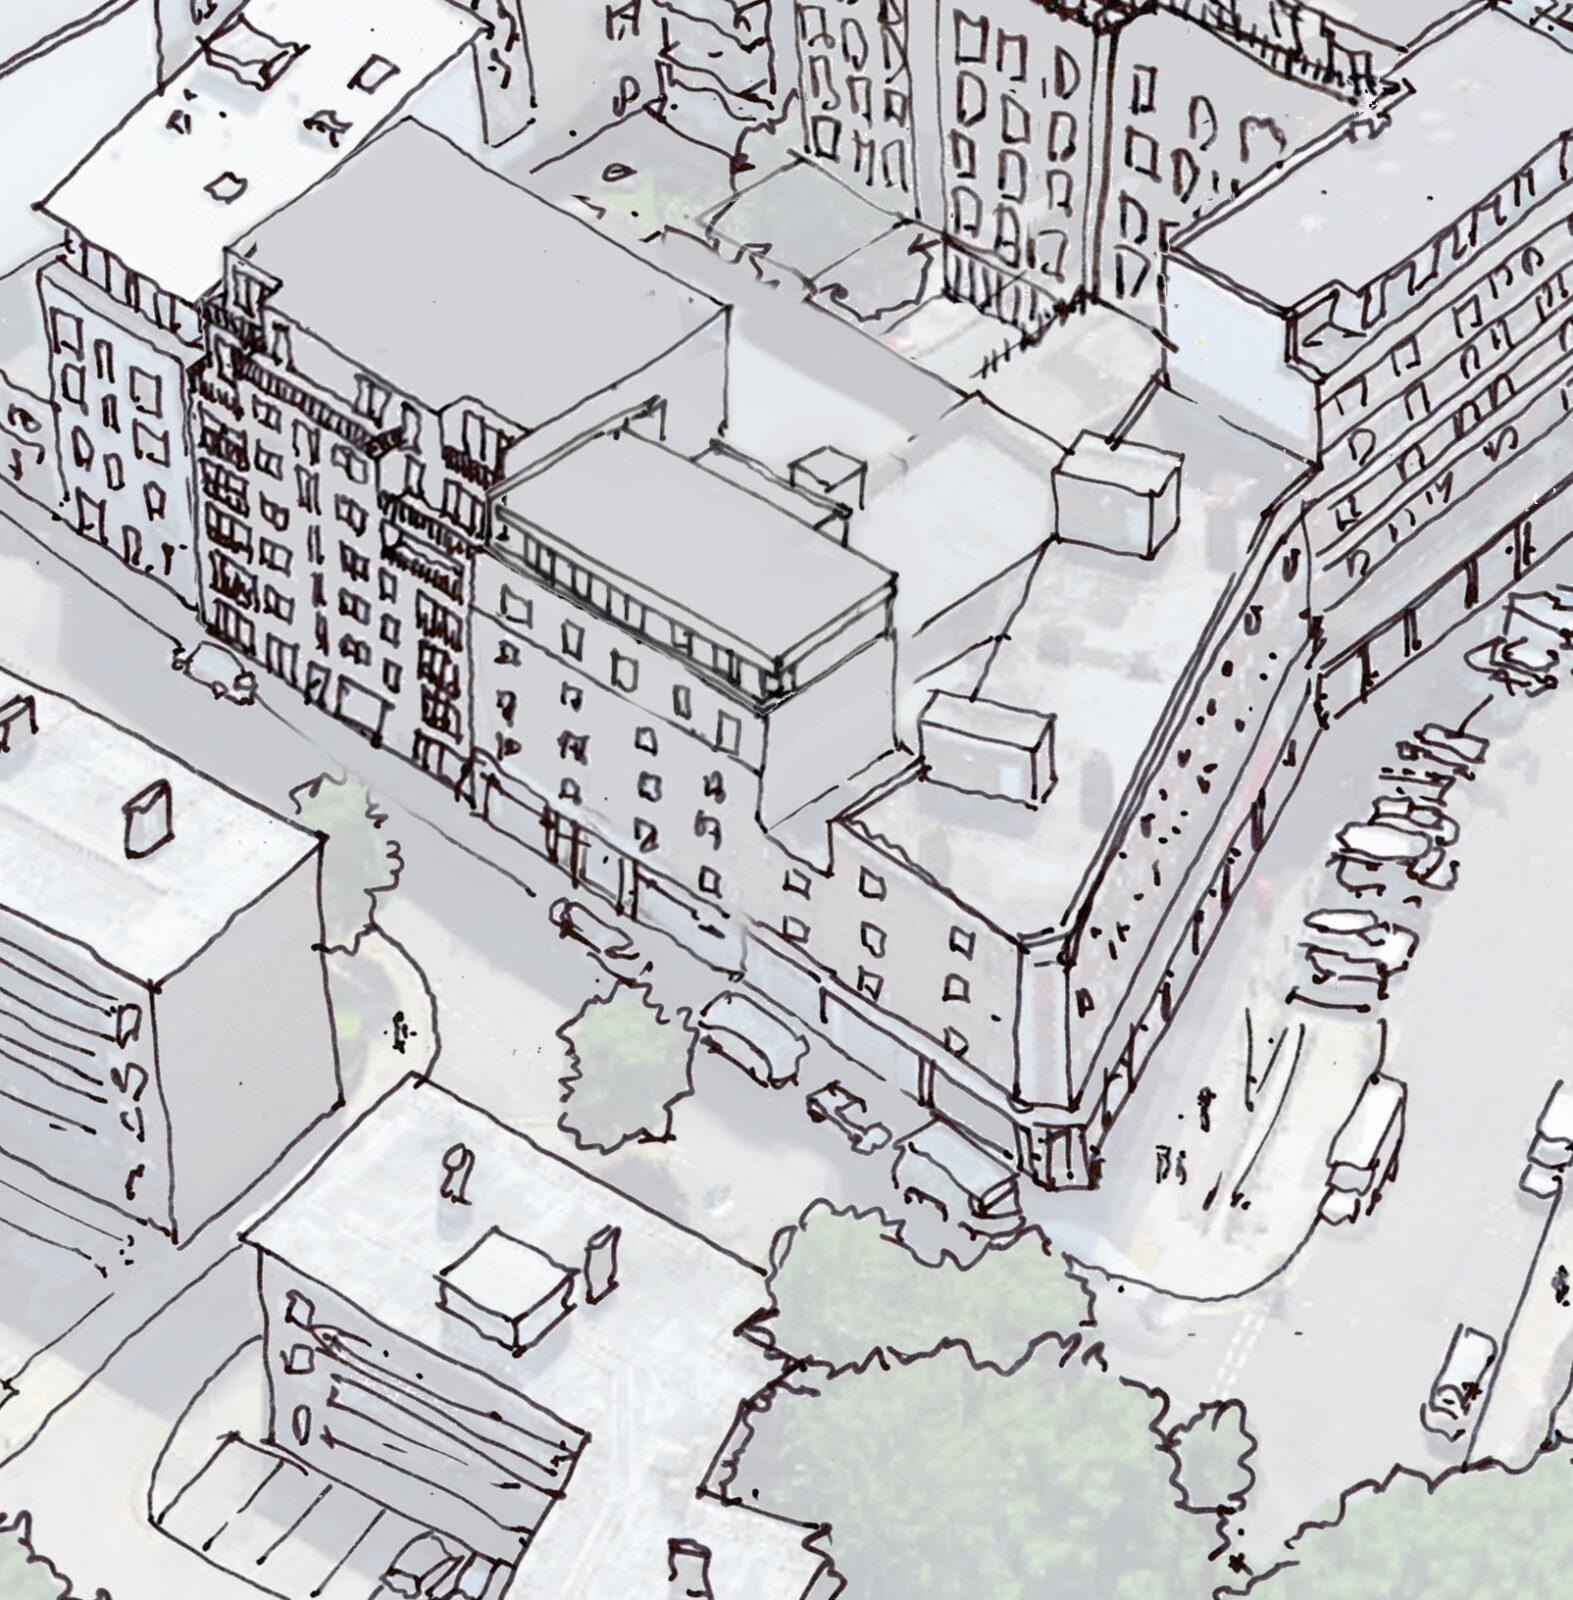 Sketch birdseye view of 66 Nelson Street